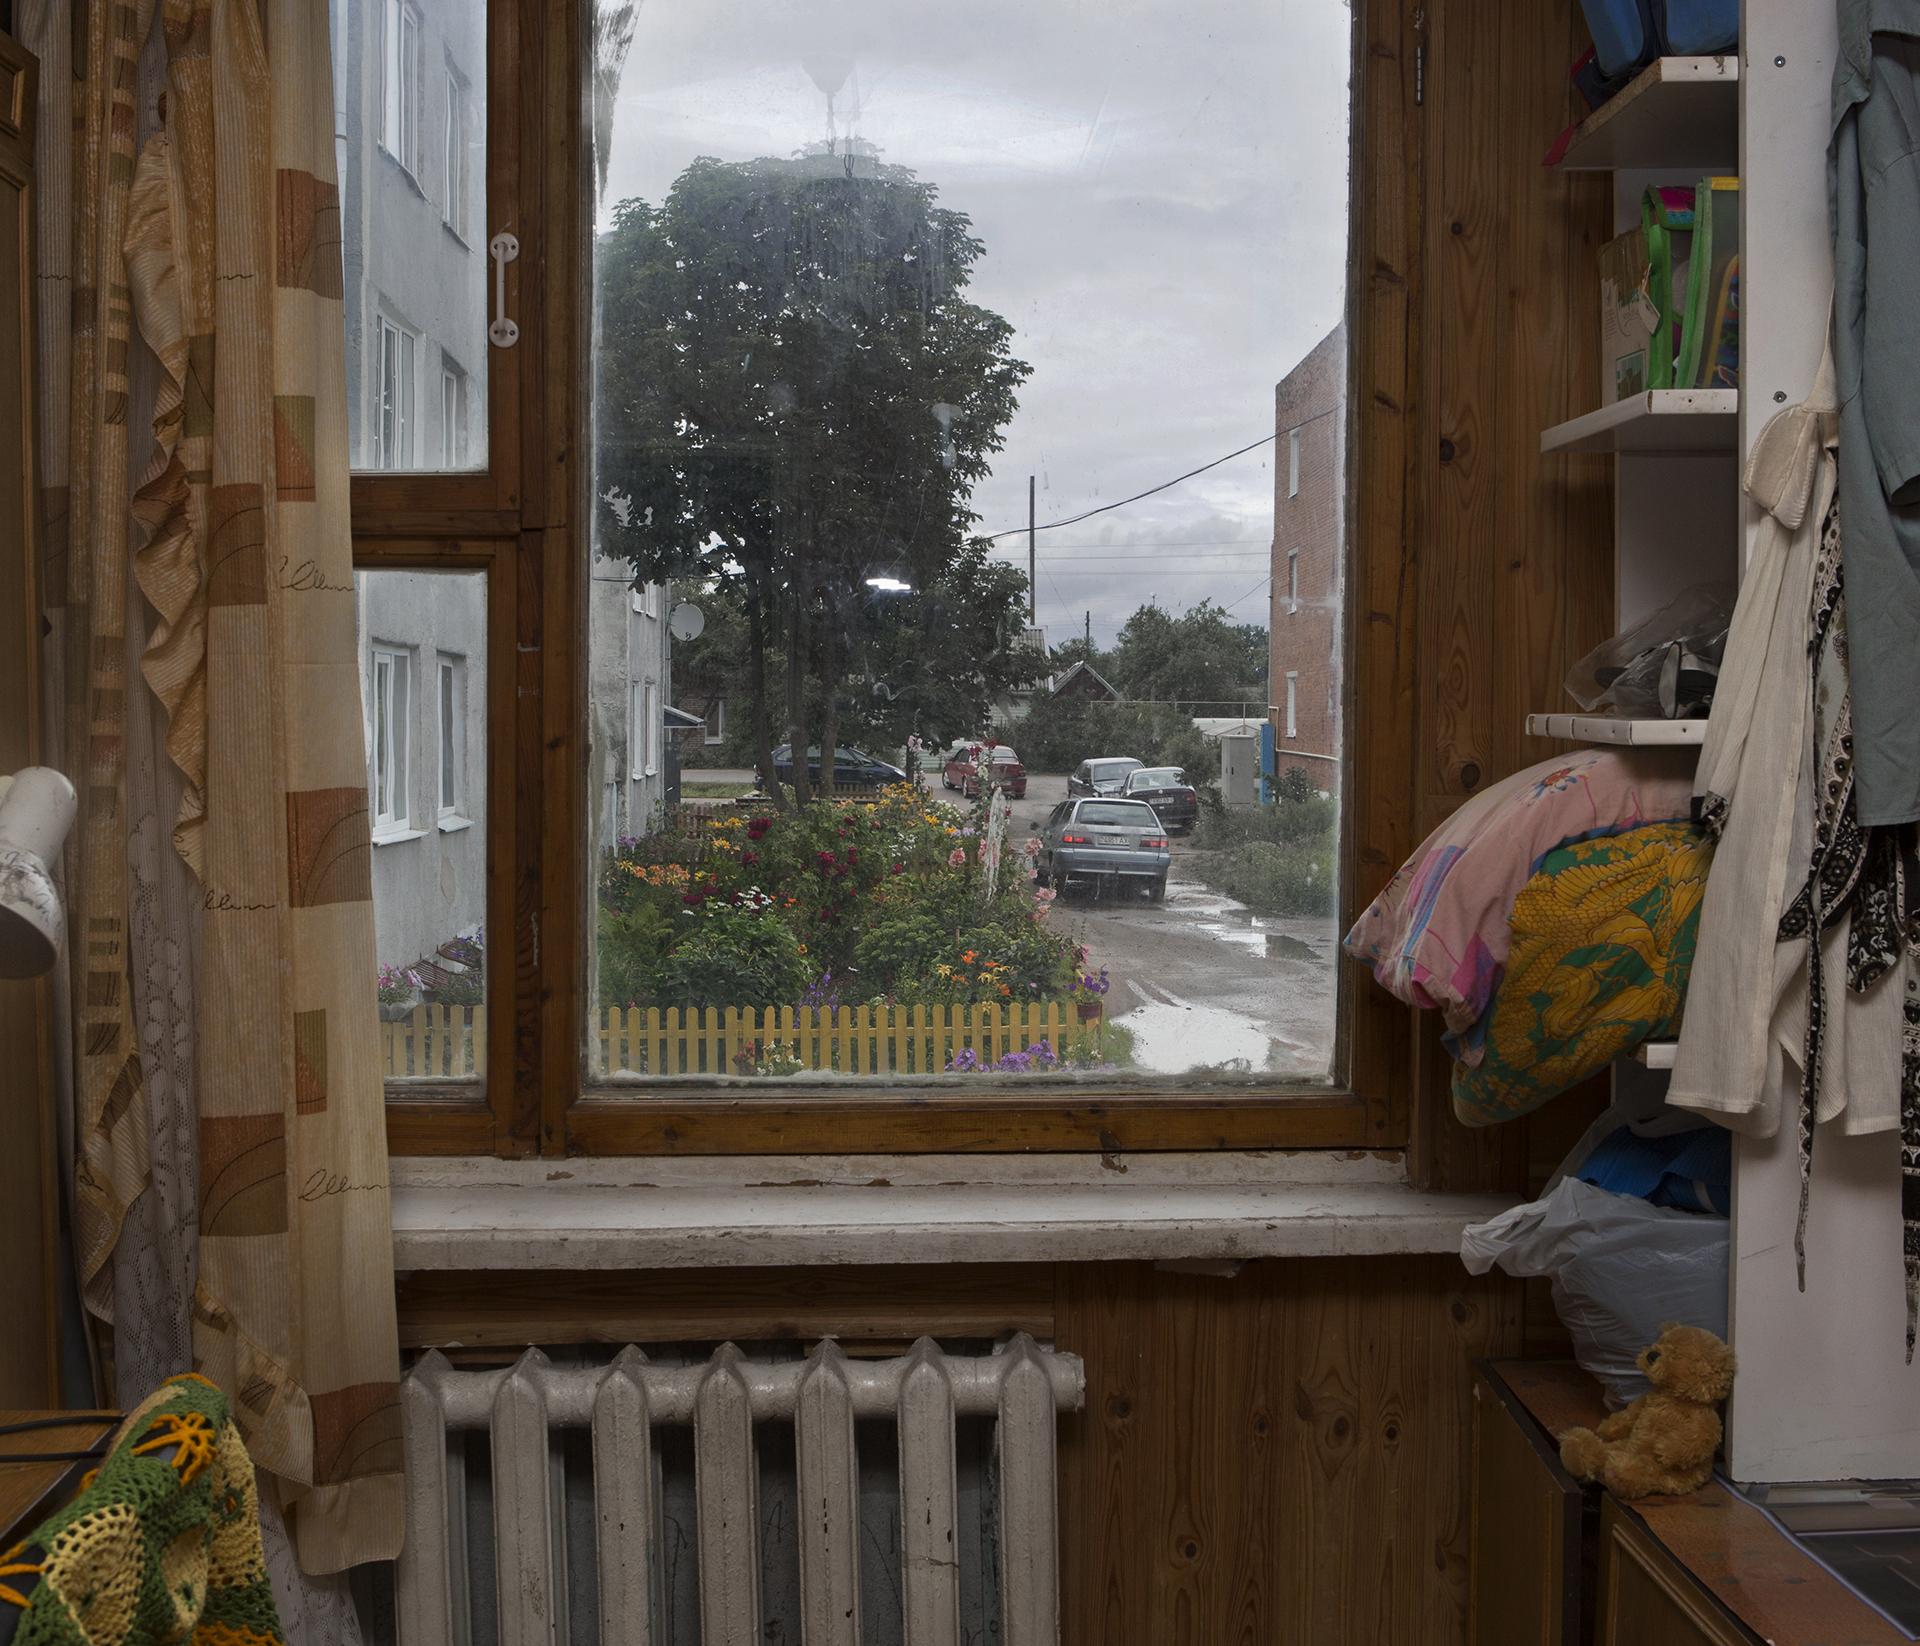 jadwiga bronte.old red.belarus.misk.soviet union.window.jpg